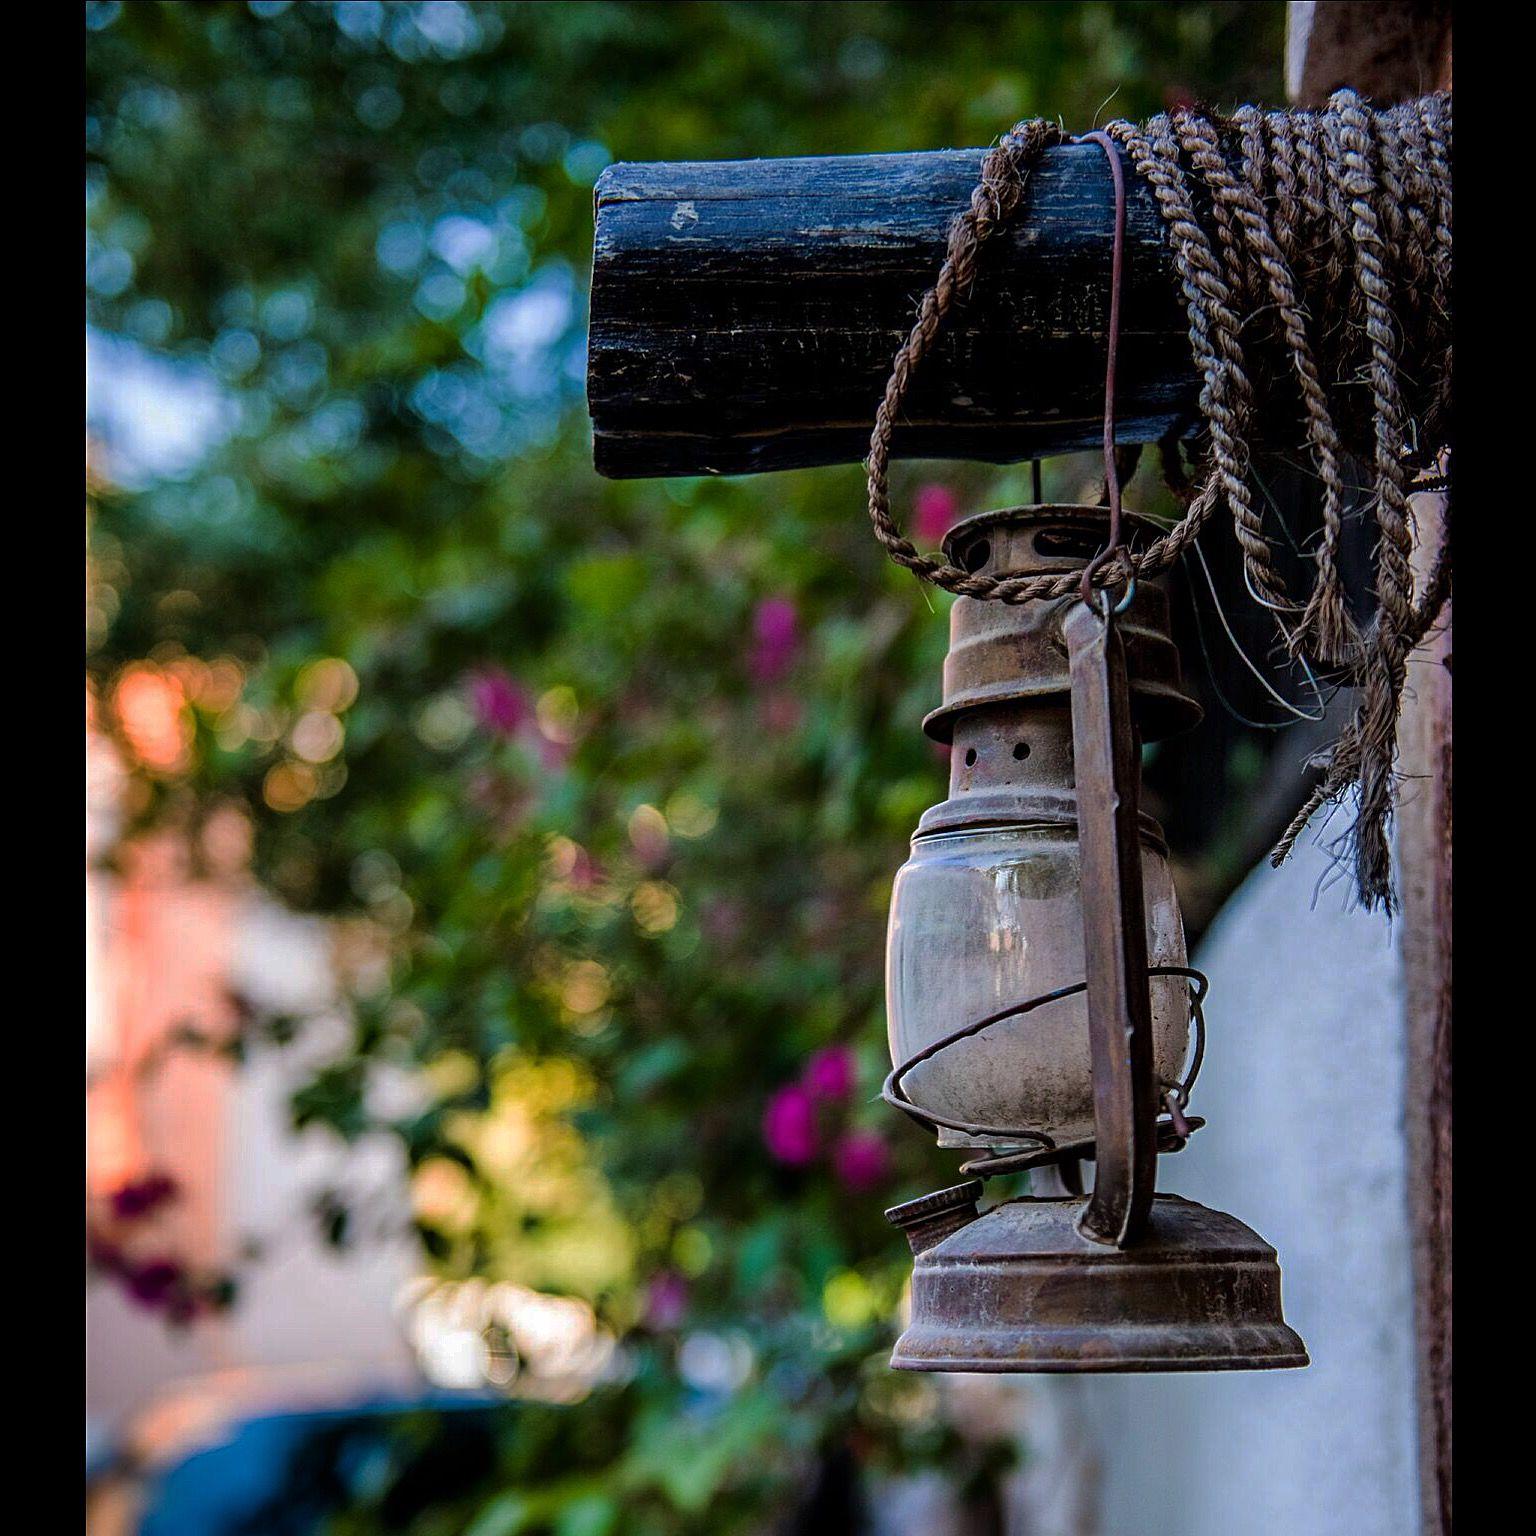 Instagram megap1xel Instagram, Hydrant, Fire hydrant